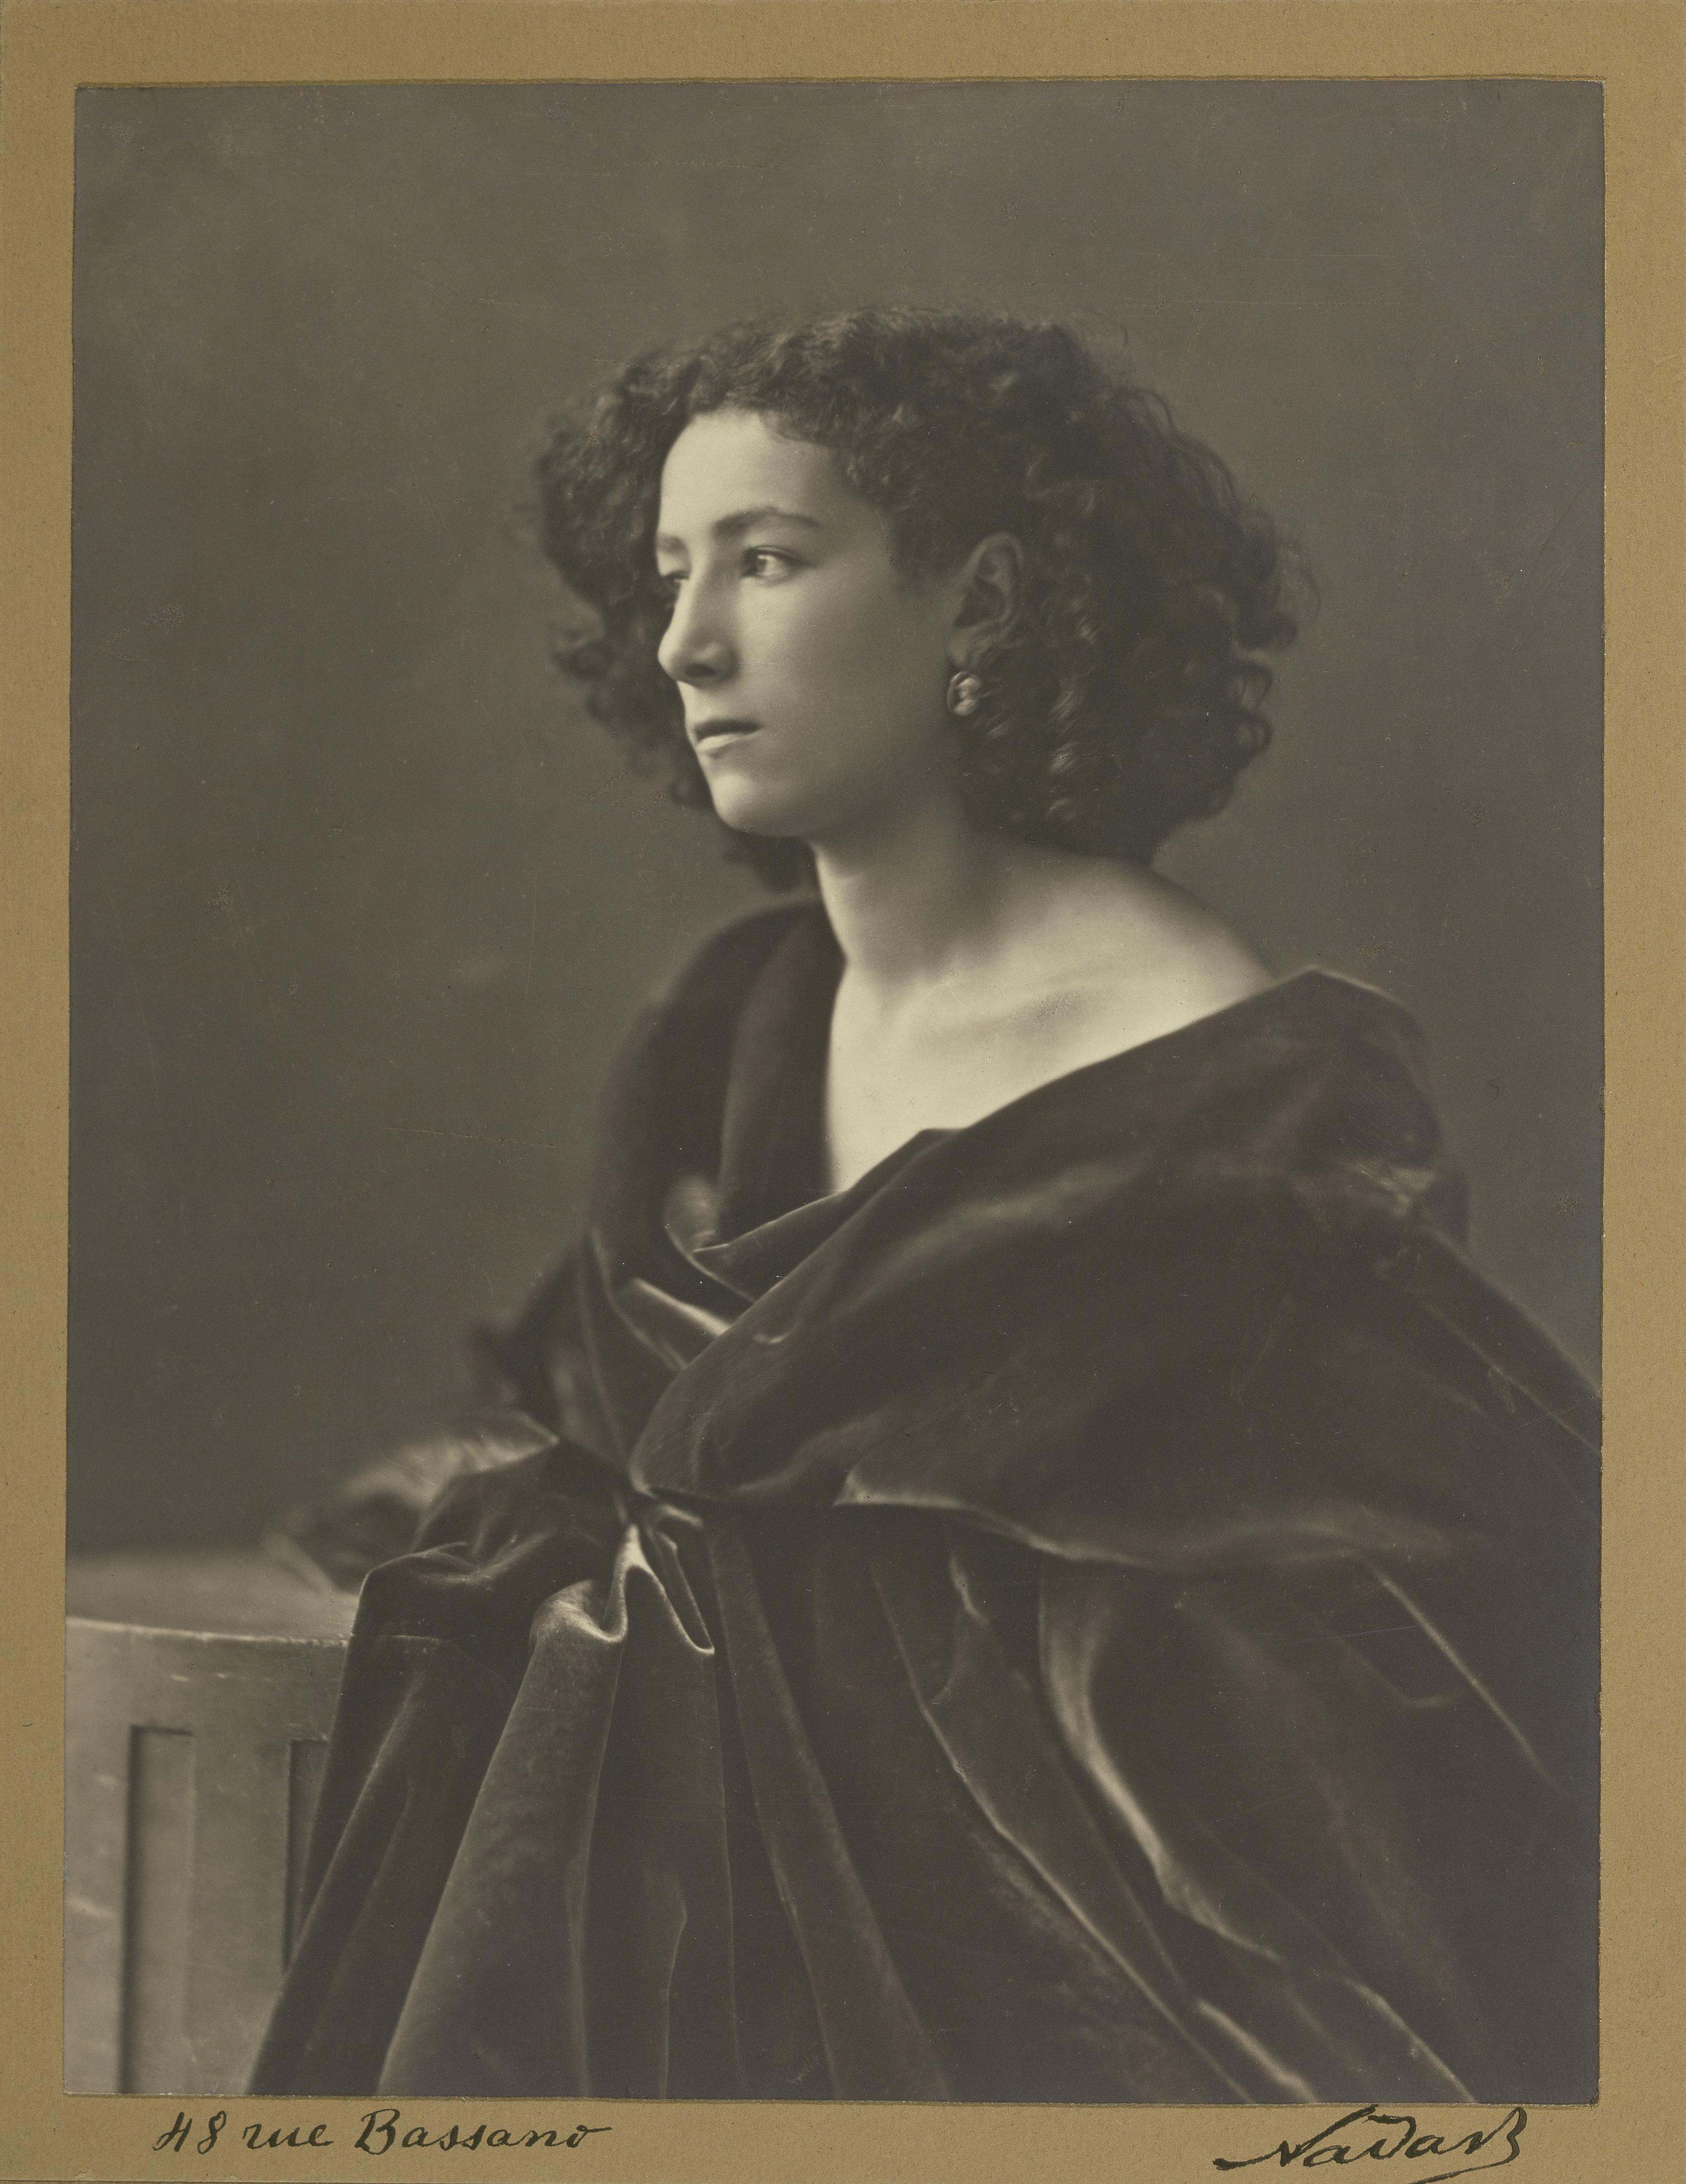 A young Sarah Bernhardt in Nadar's studio